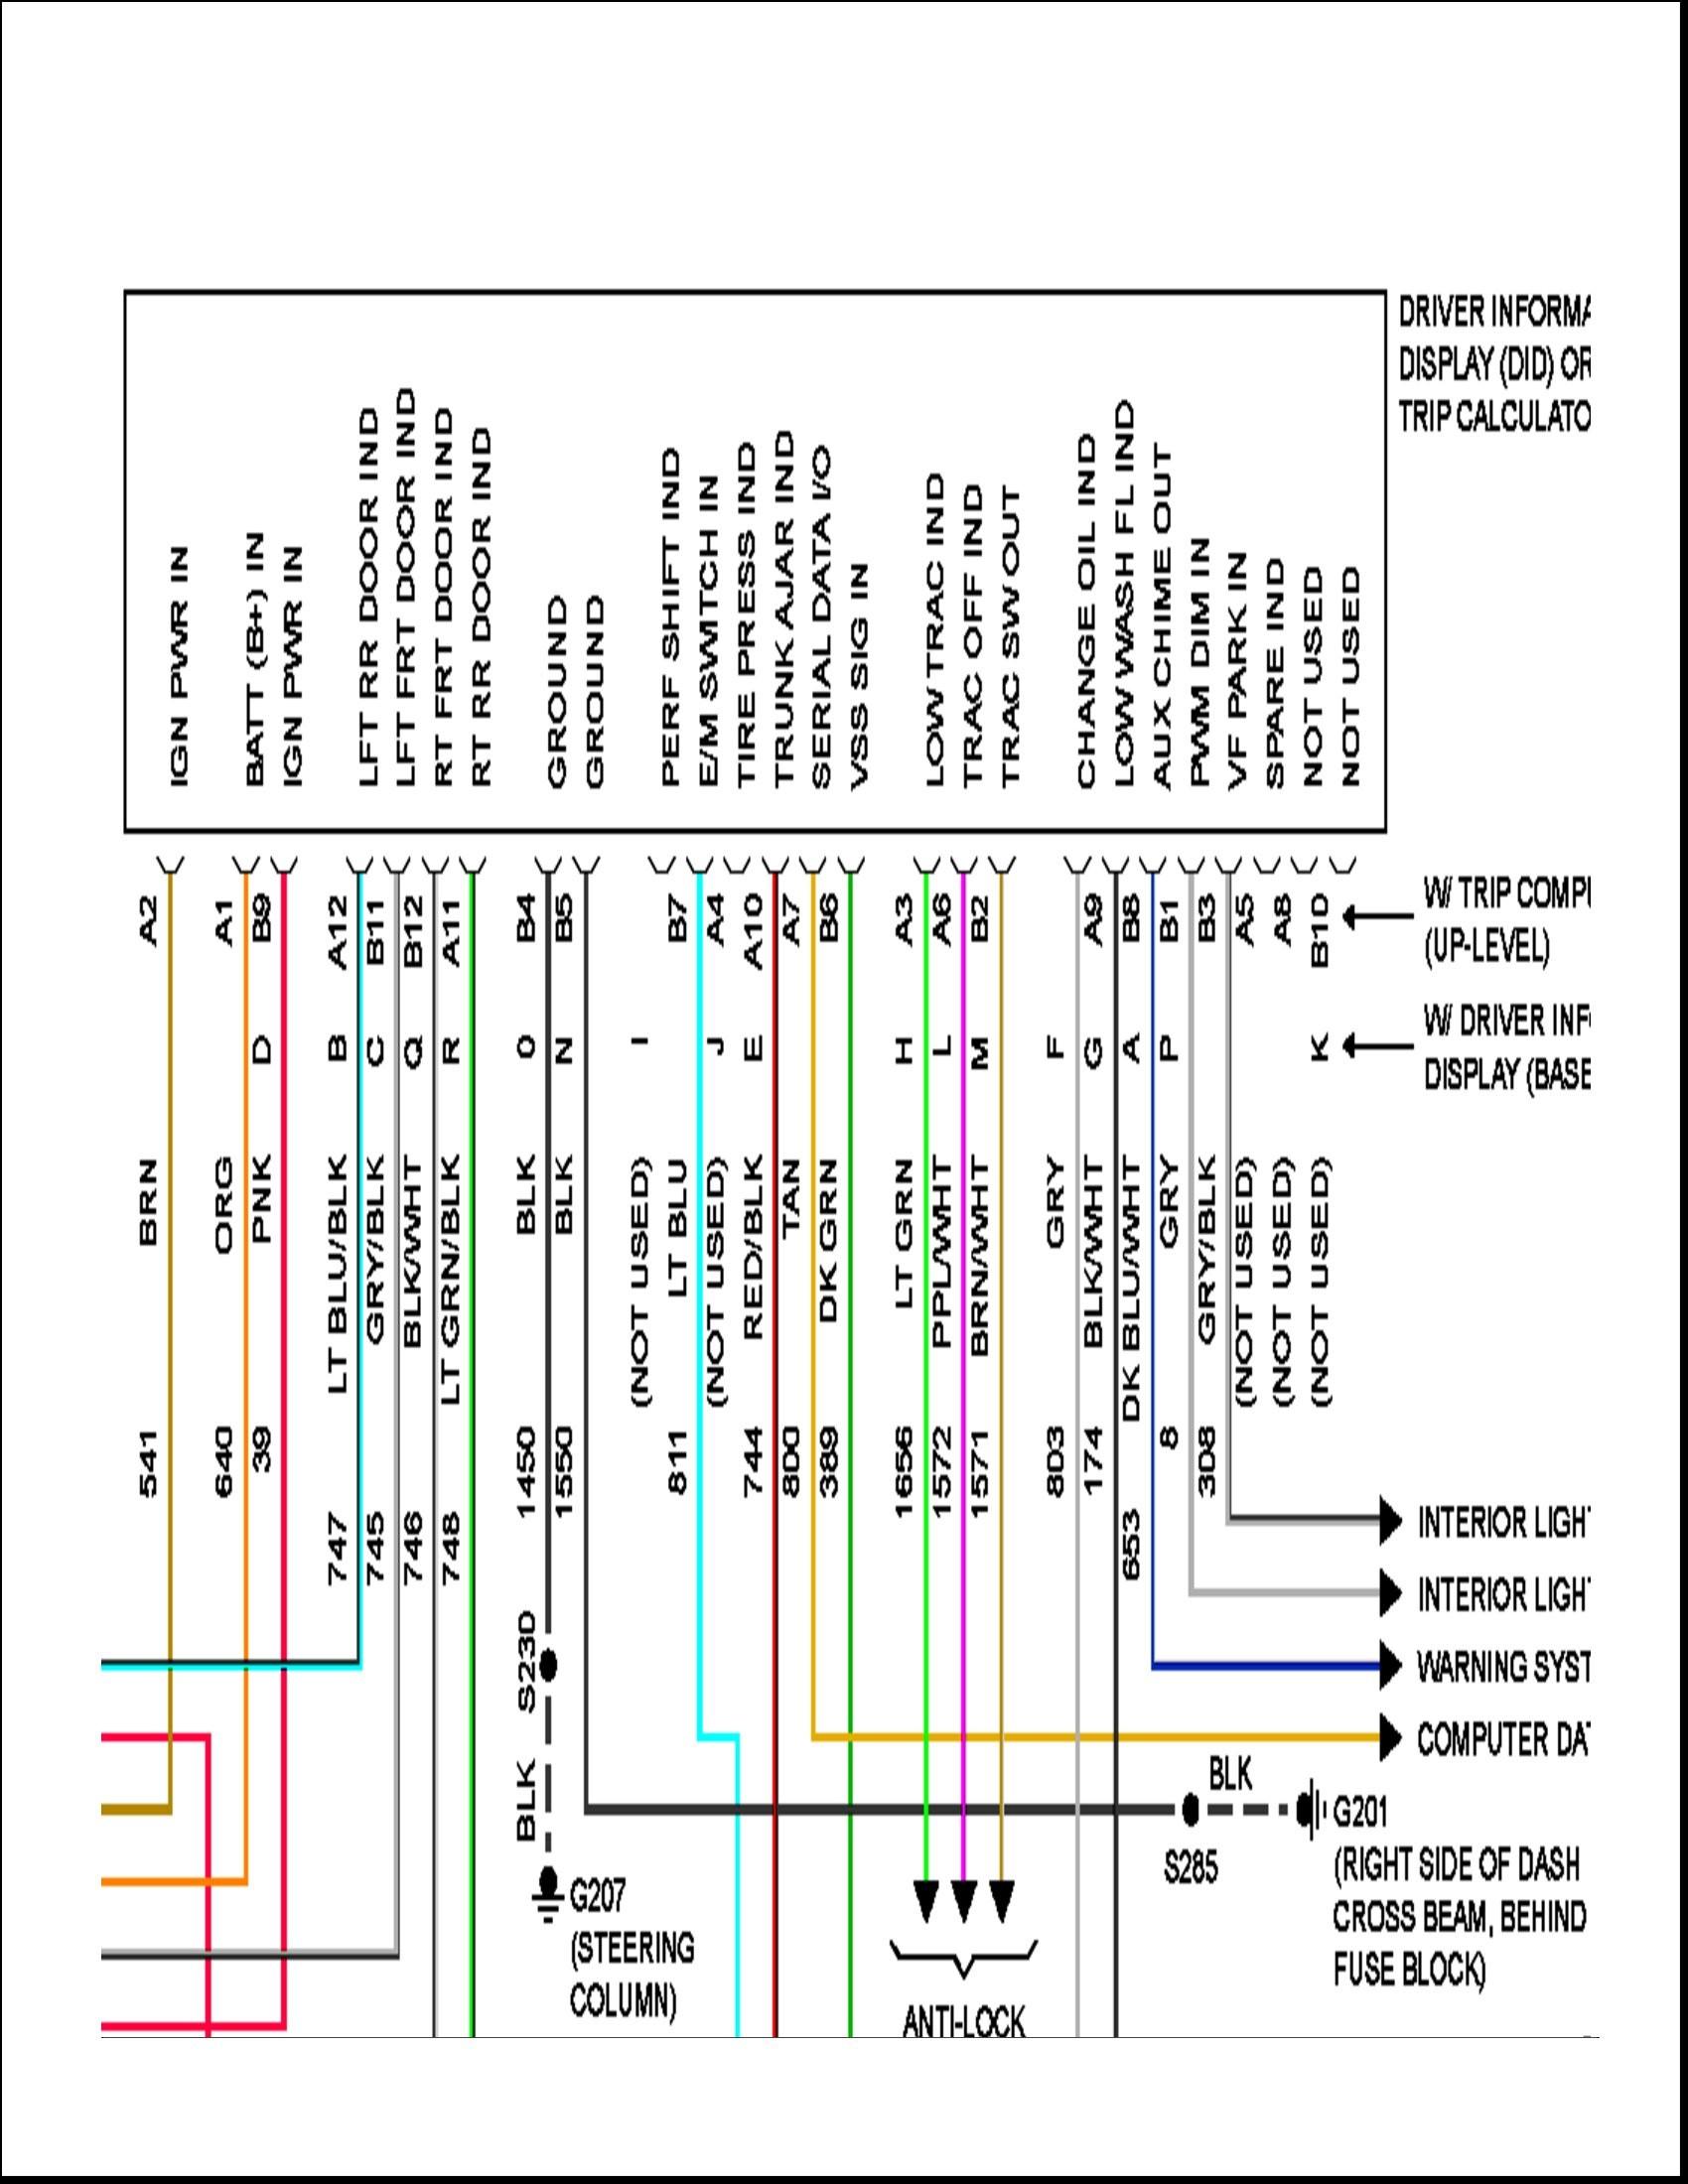 2005 pontiac grand prix radio wiring diagram Collection-1998 pontiac radio wiring explore schematic wiring diagram u2022 rh webwiringdiagram today 1998 pontiac grand prix 15-o